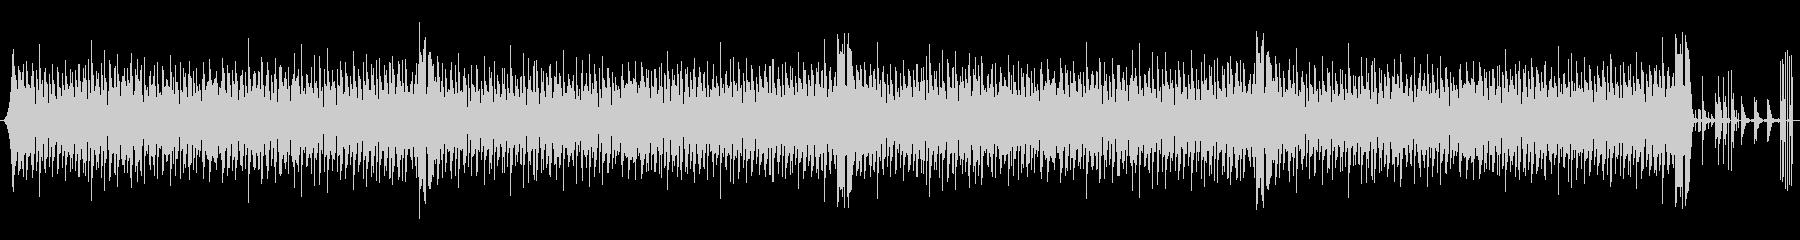 Kawaii系エレクトロ風BGMです。の未再生の波形